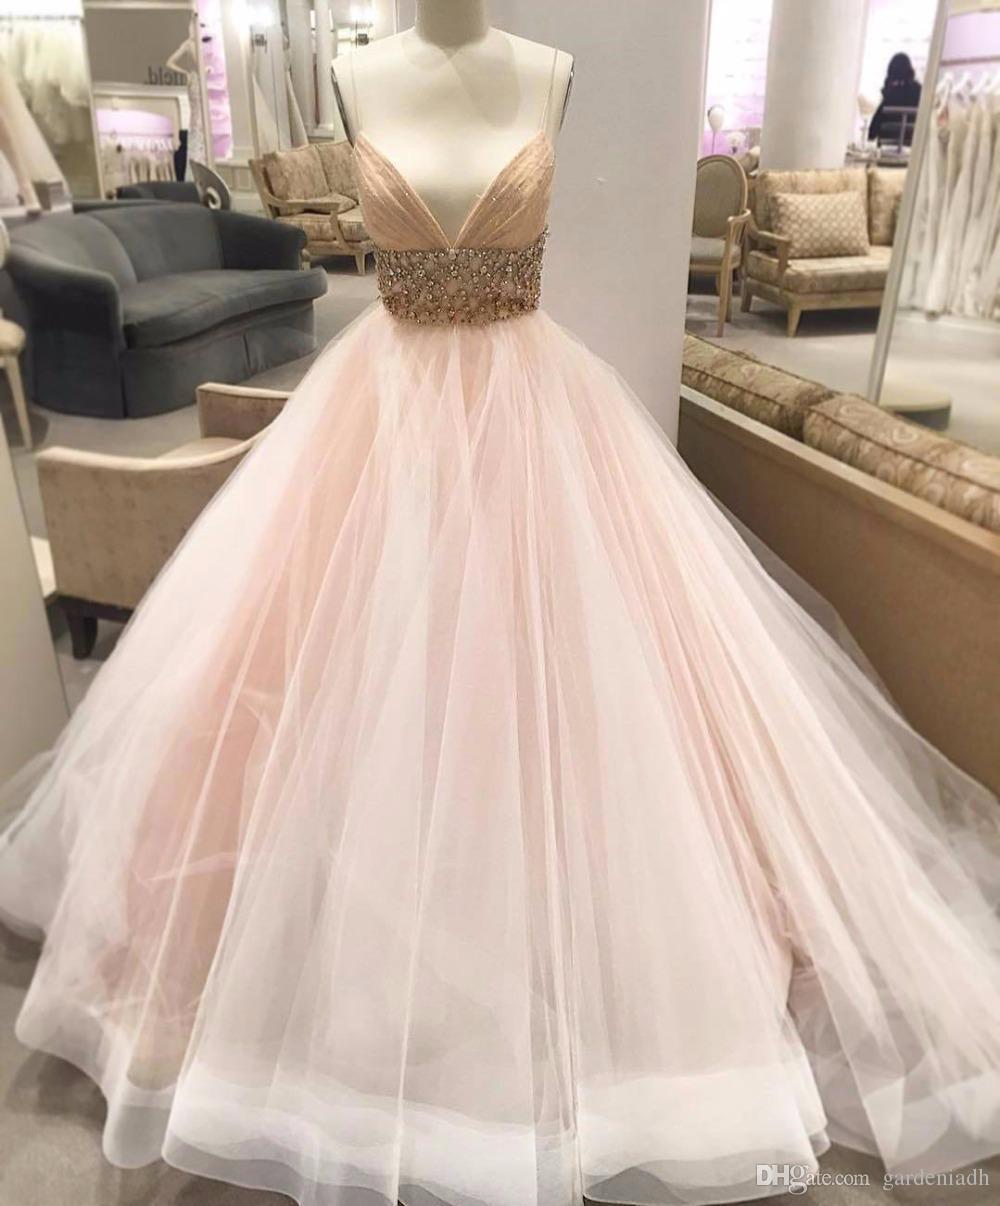 blush wedding dresses lazaro photo - 1